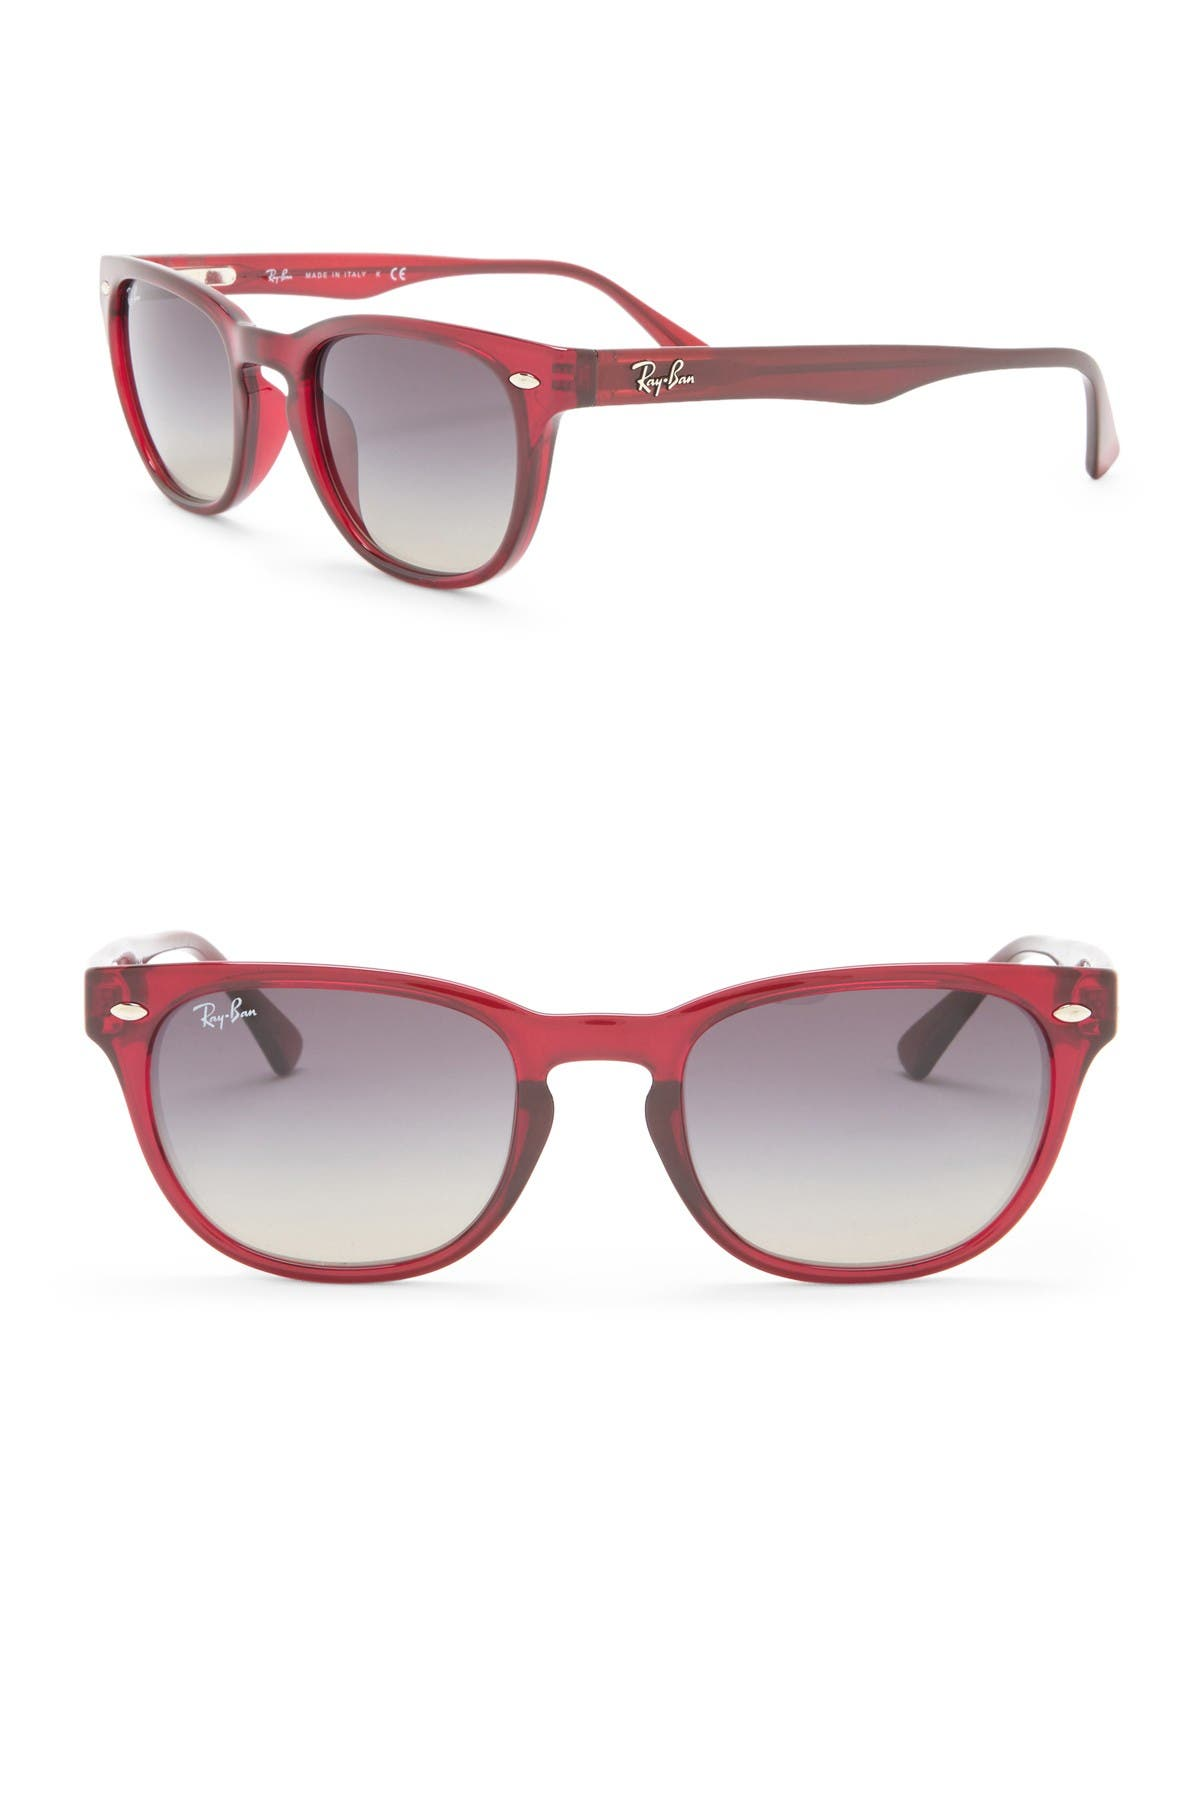 Image of Ray-Ban 49mm Wayfarer Sunglasses